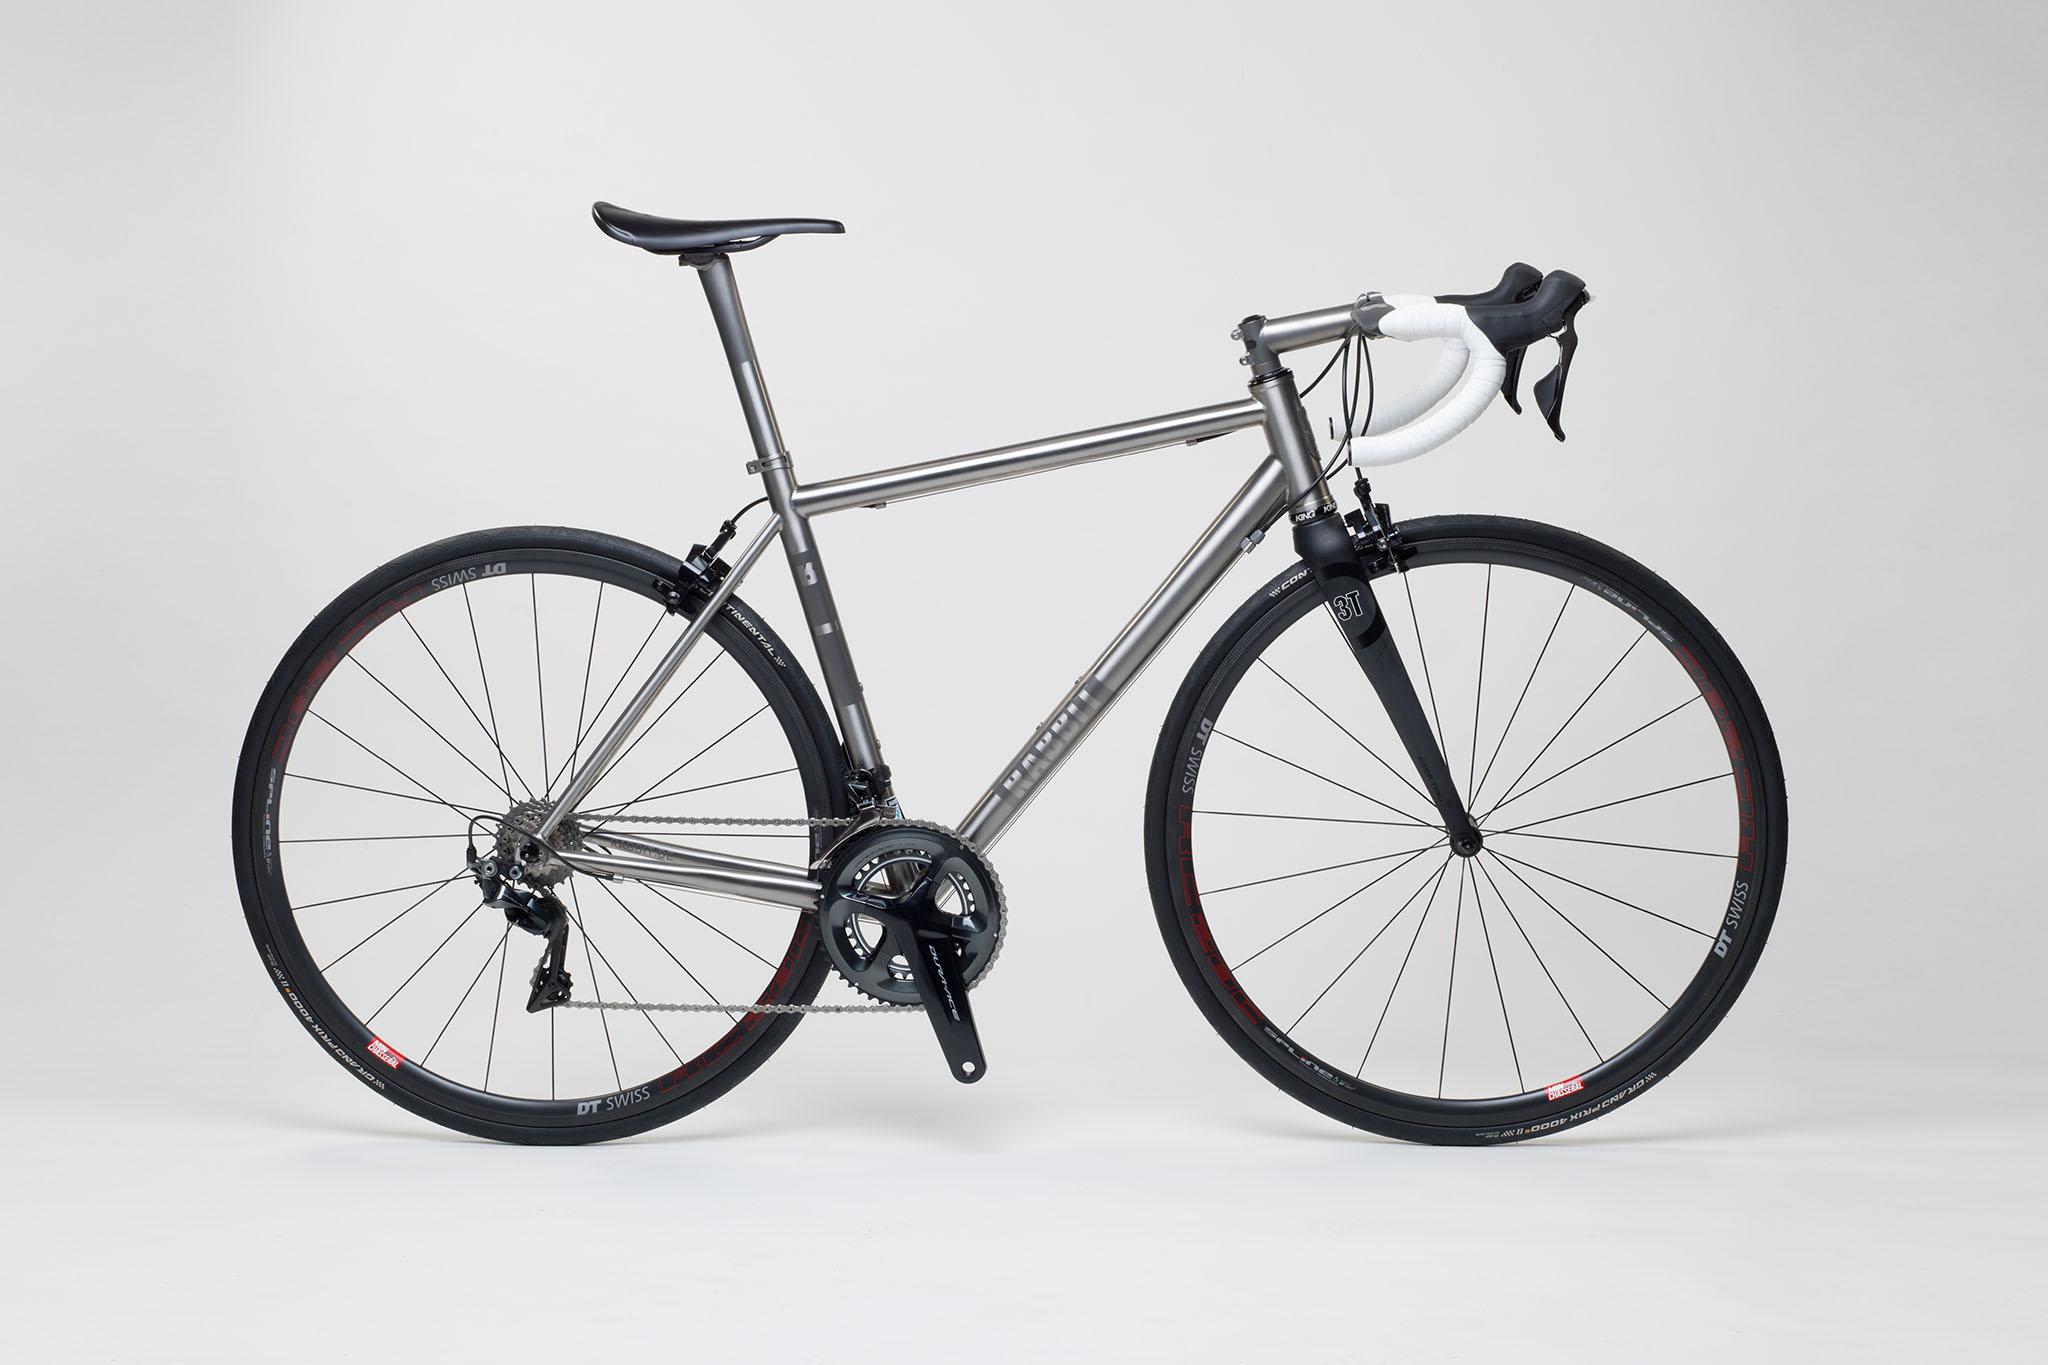 titan_road_classic_bike_01_from_rabbit_titan_cycles_bavaria